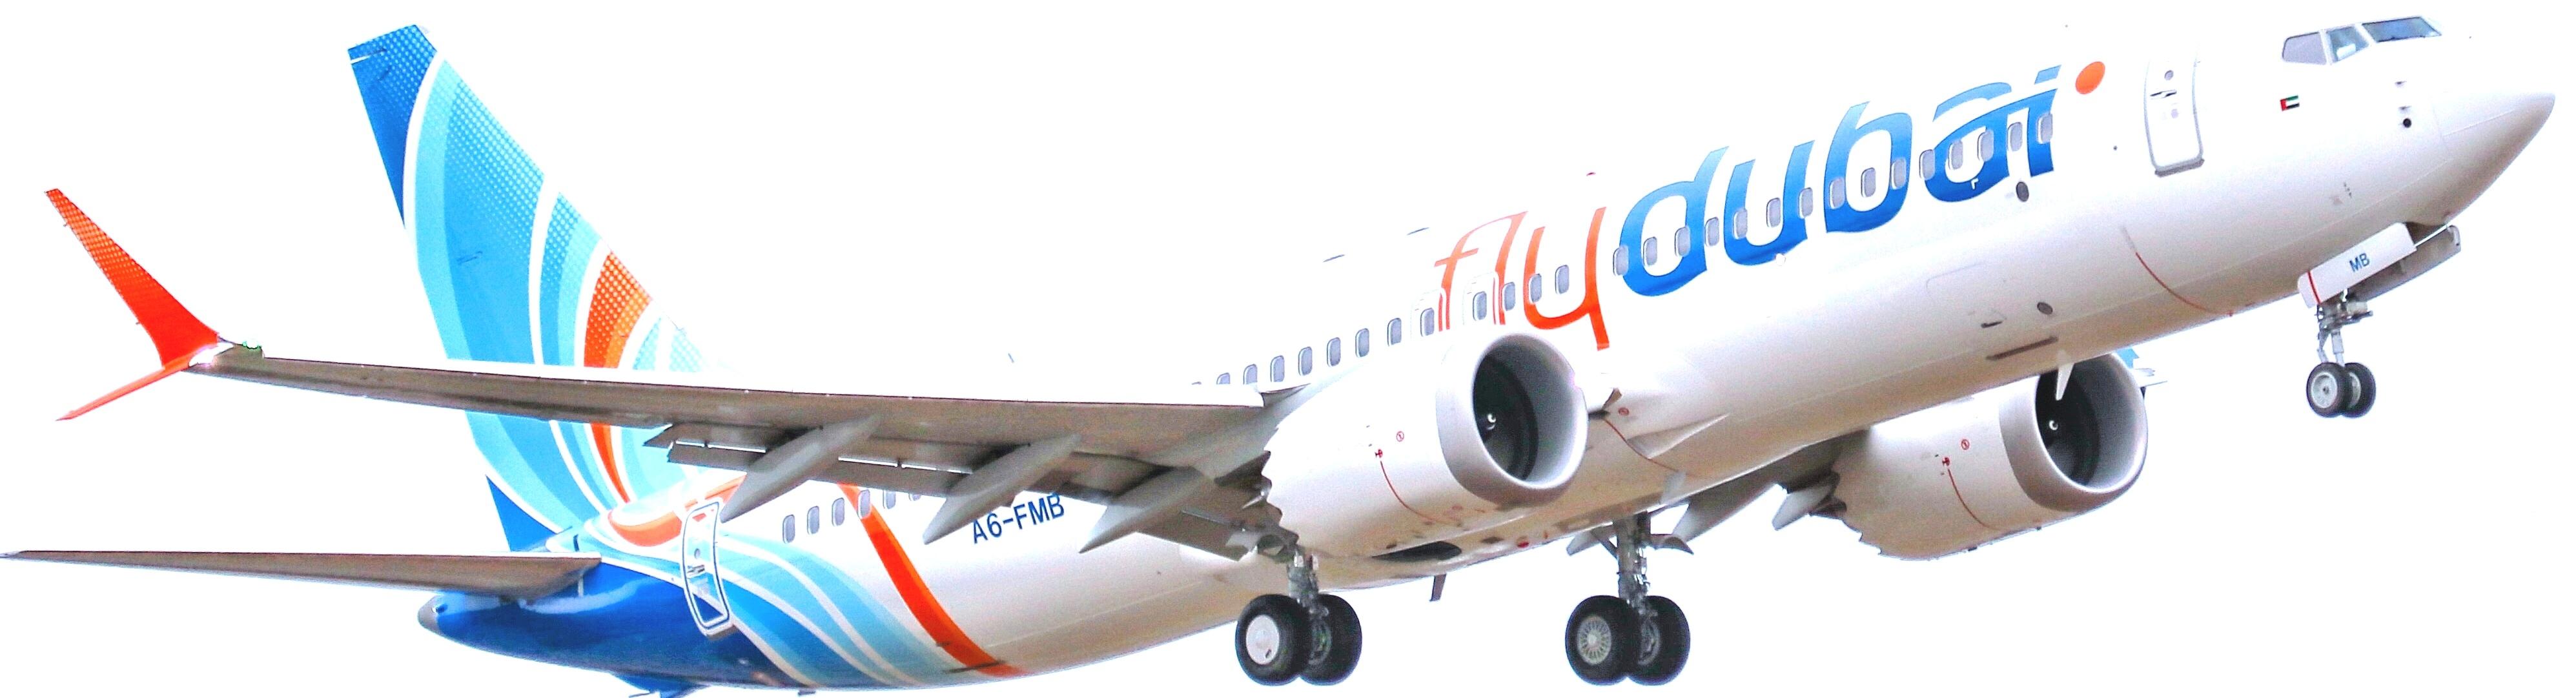 AW-70773370